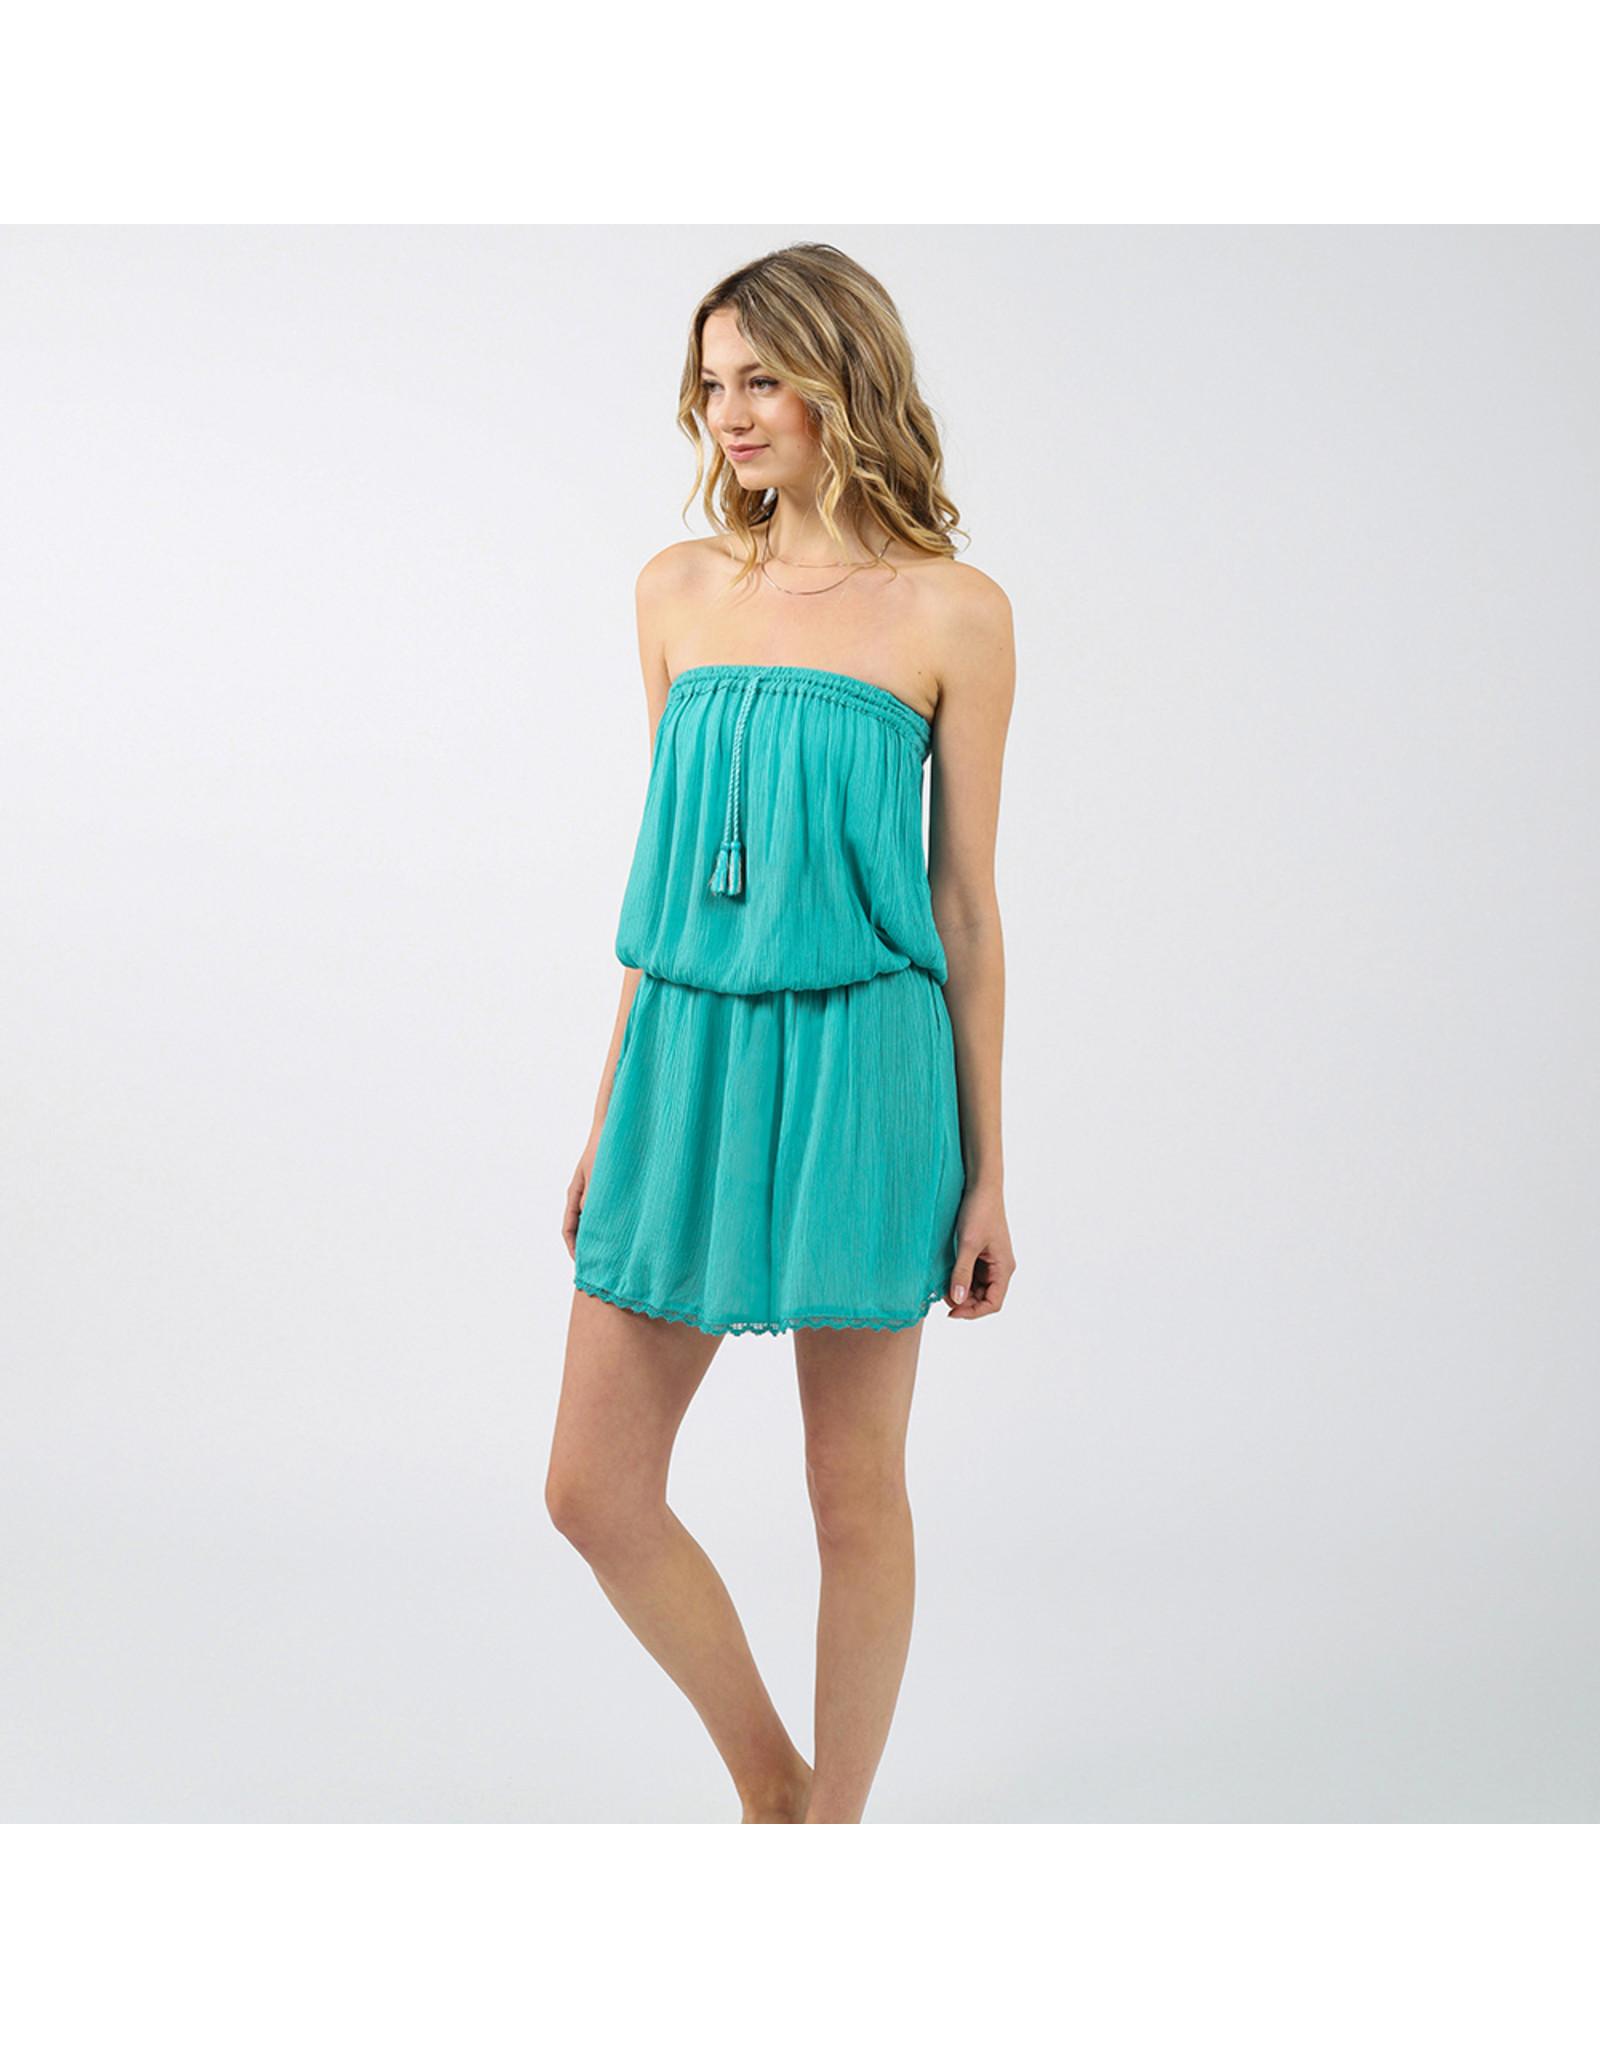 Miami Bandeau Dress